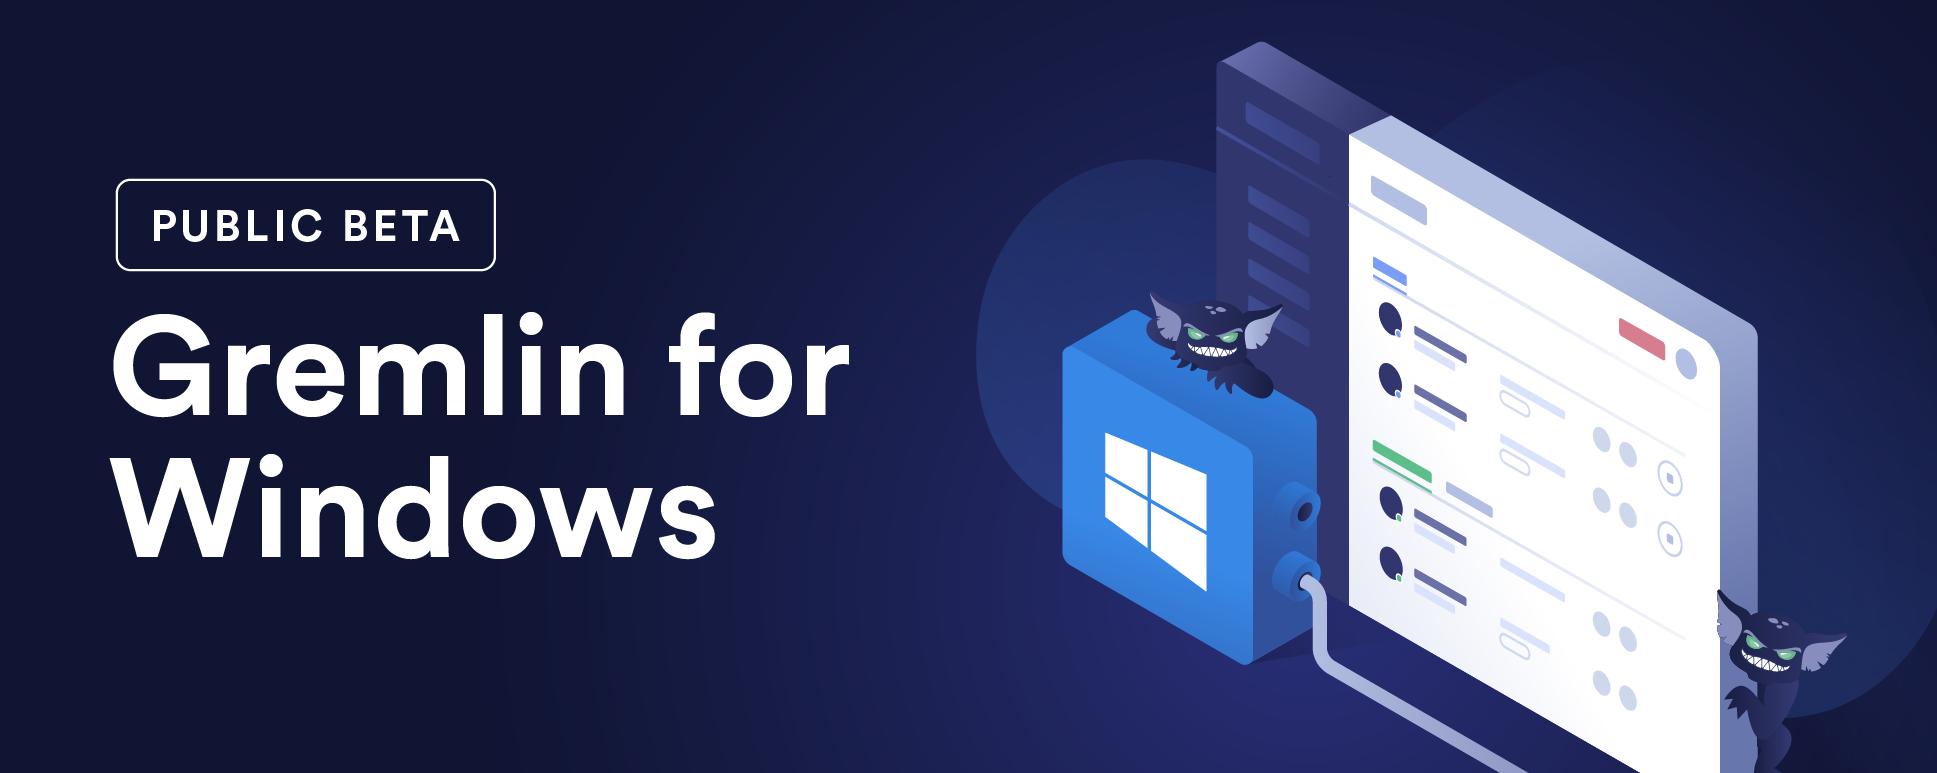 Public Beta: Gremlin for Windows